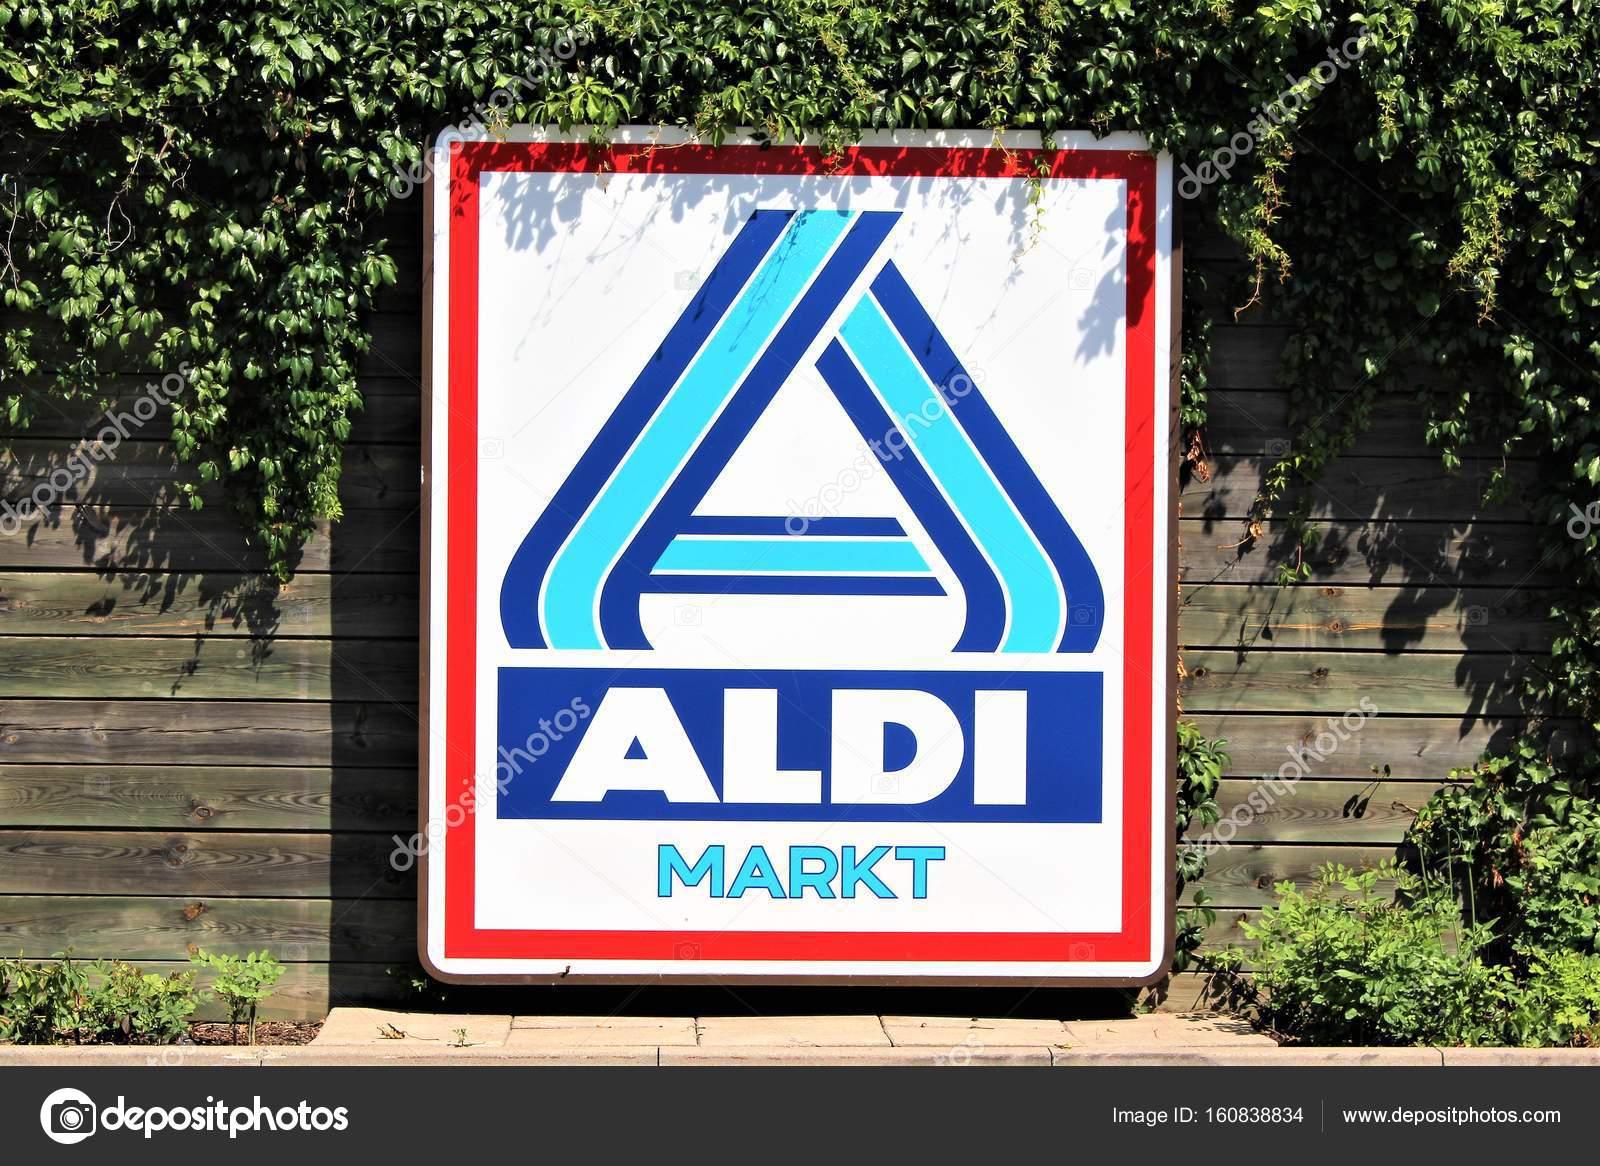 An image of a ALDI supermarket sign - logo - Bad Pyrmont